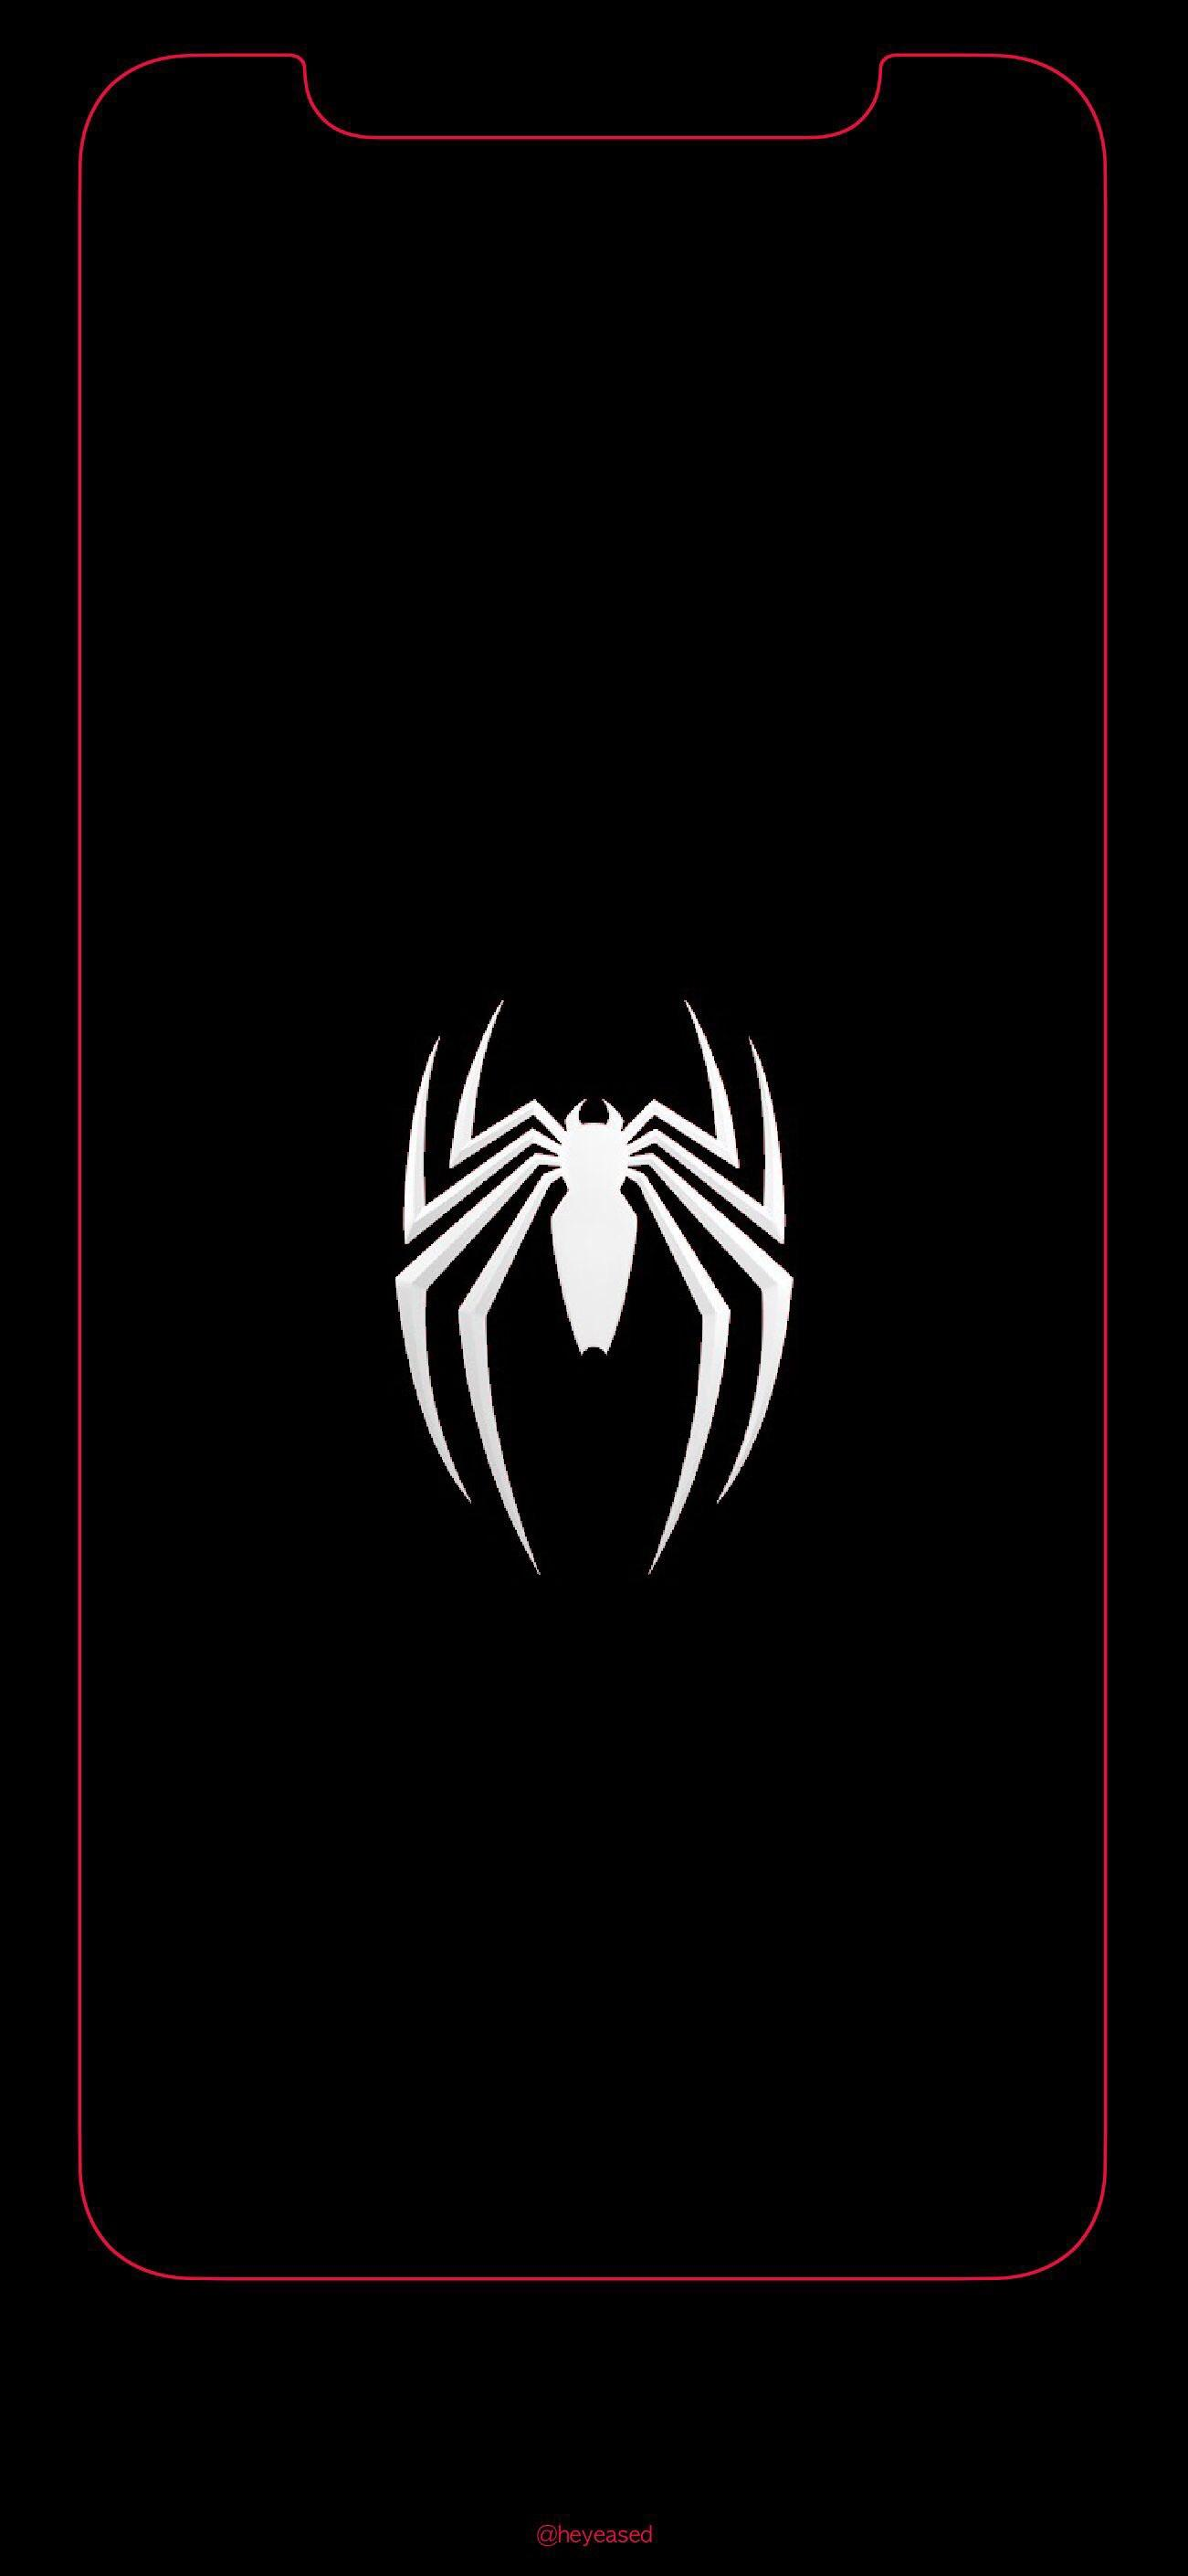 Free Download Iphone X Spiderman Logo Wallpaper Spidermanps4 1301x2820 For Your Desktop Mobile Tablet Explore 54 Hd Logo Spider Man Iphone Wallpapers Hd Logo Spider Man Iphone Wallpapers Spider